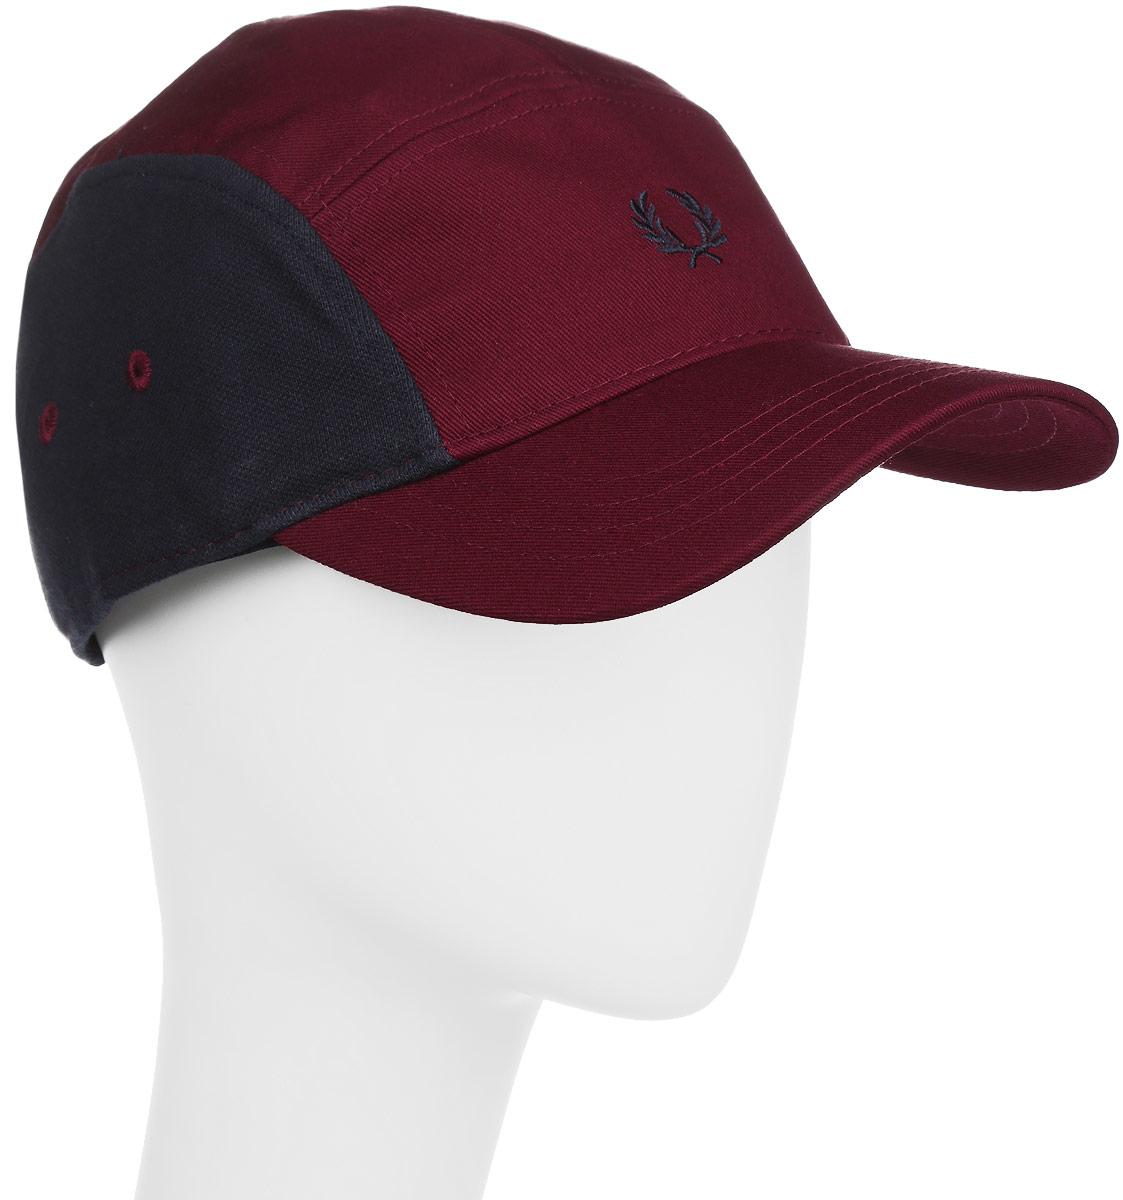 Кепка мужская Fred Perry Pique Mix 5 Panelled Baseball Cap, цвет: бордовый. HW1615-106. Размер универсальныйHW1615-106